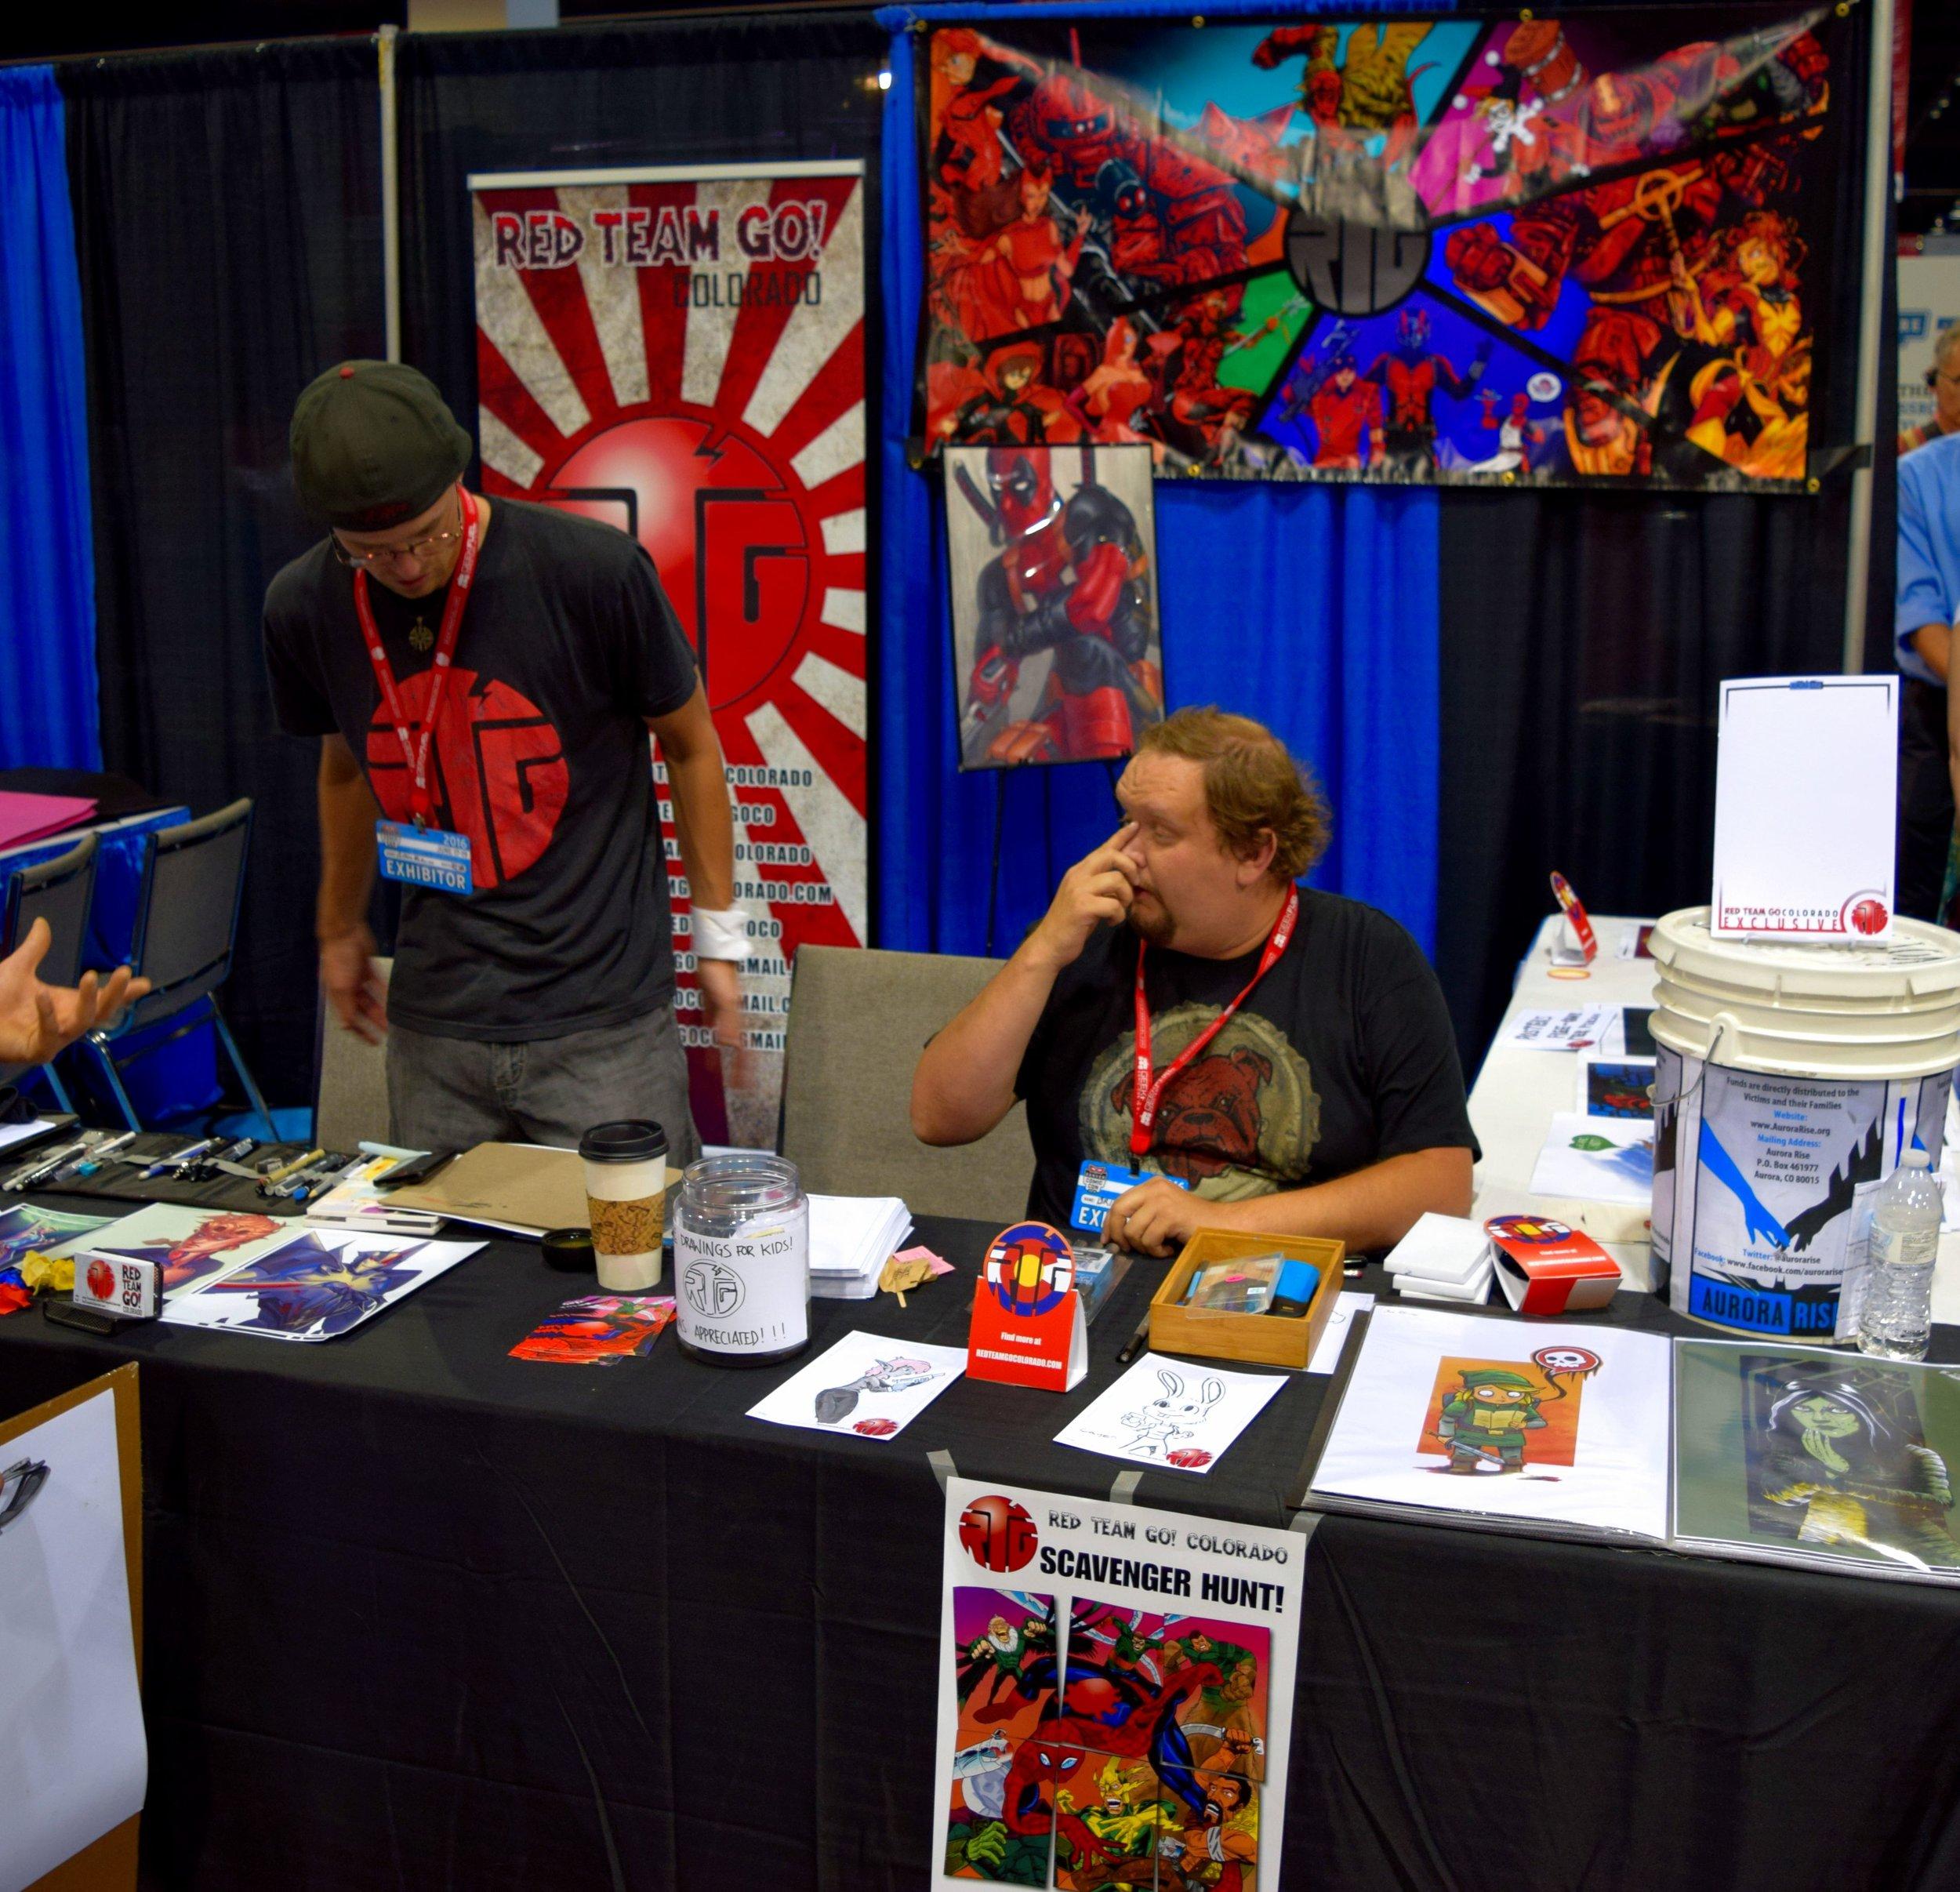 Colton Muheim & Cayen Sim of Red Team Go doing free sketches at Denver Comic Con 2016.